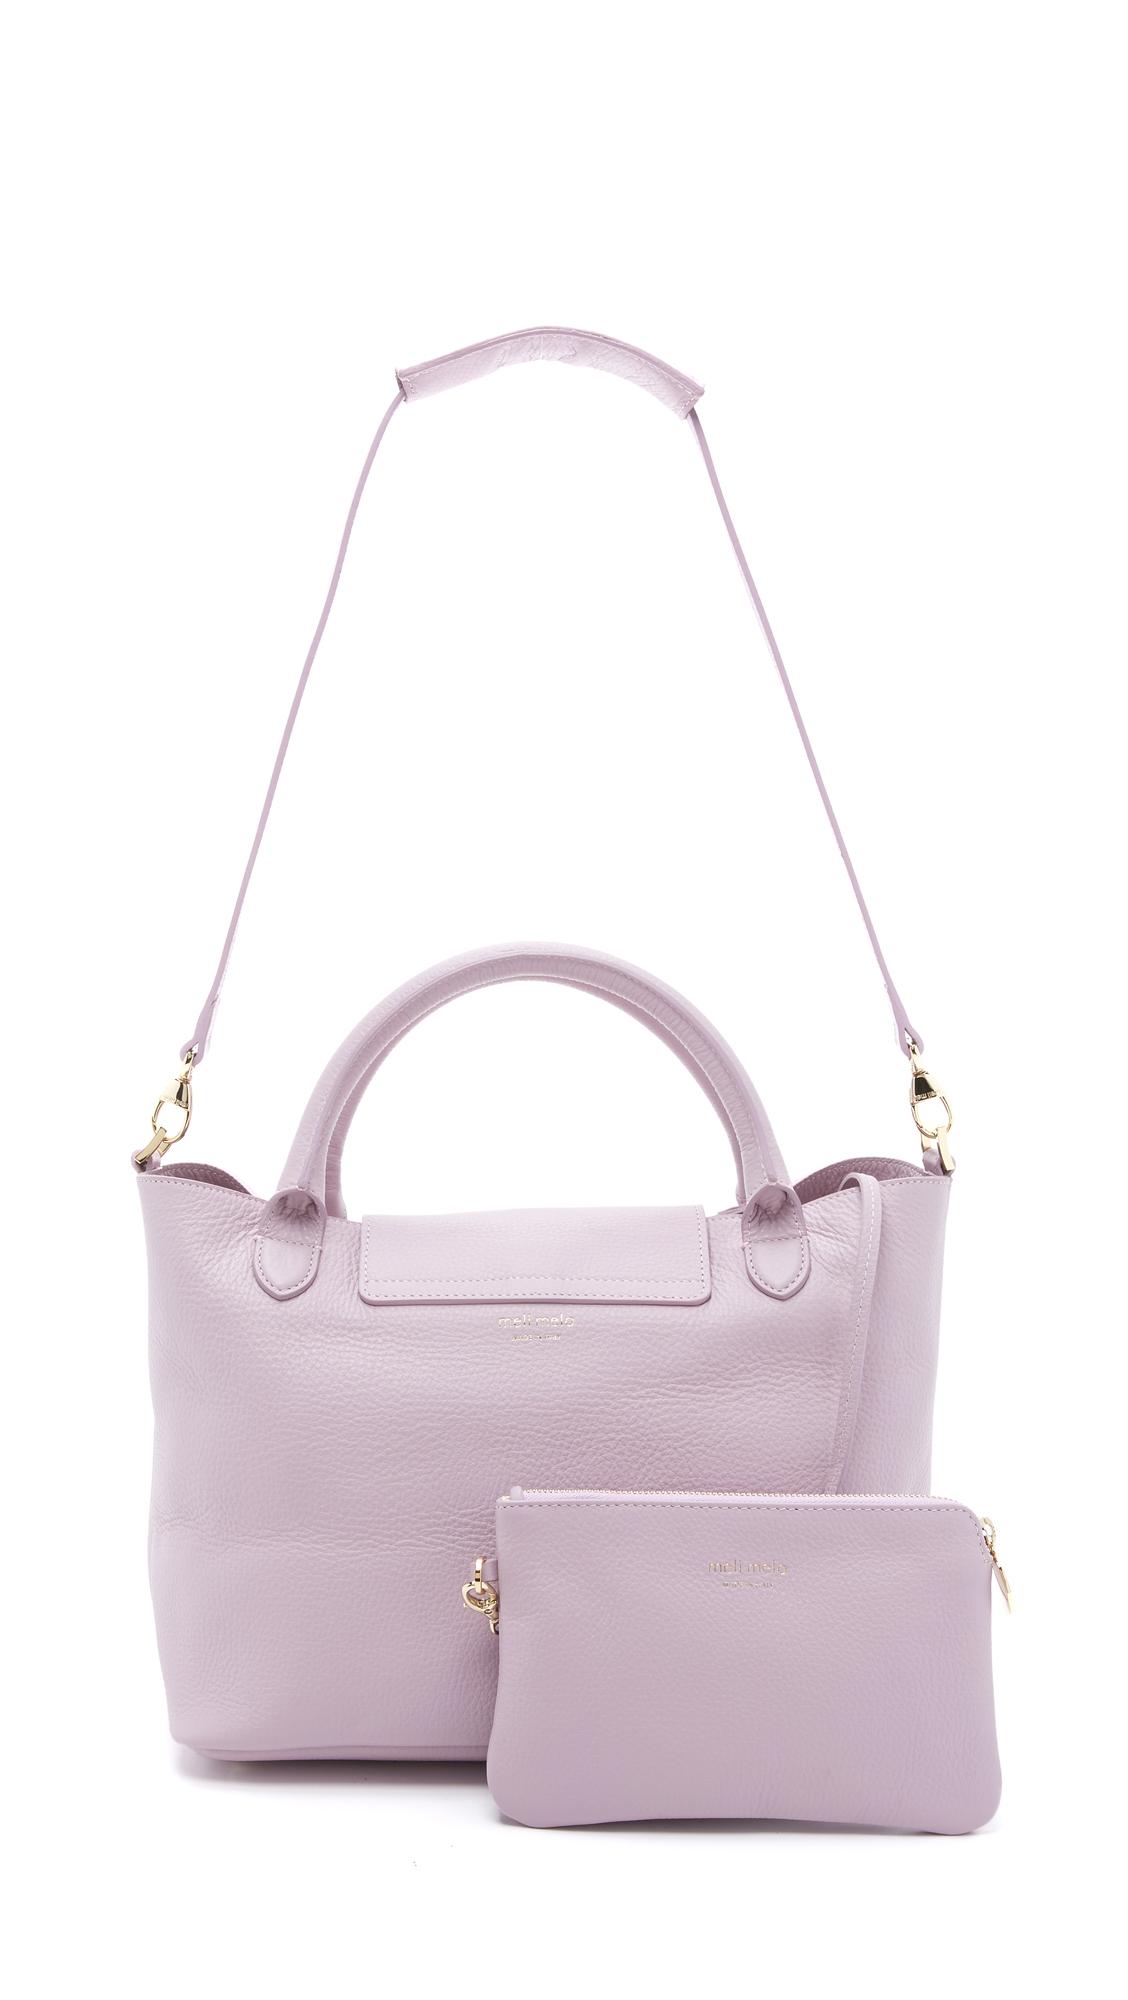 meli melo medium thela halo bag in pink lyst. Black Bedroom Furniture Sets. Home Design Ideas